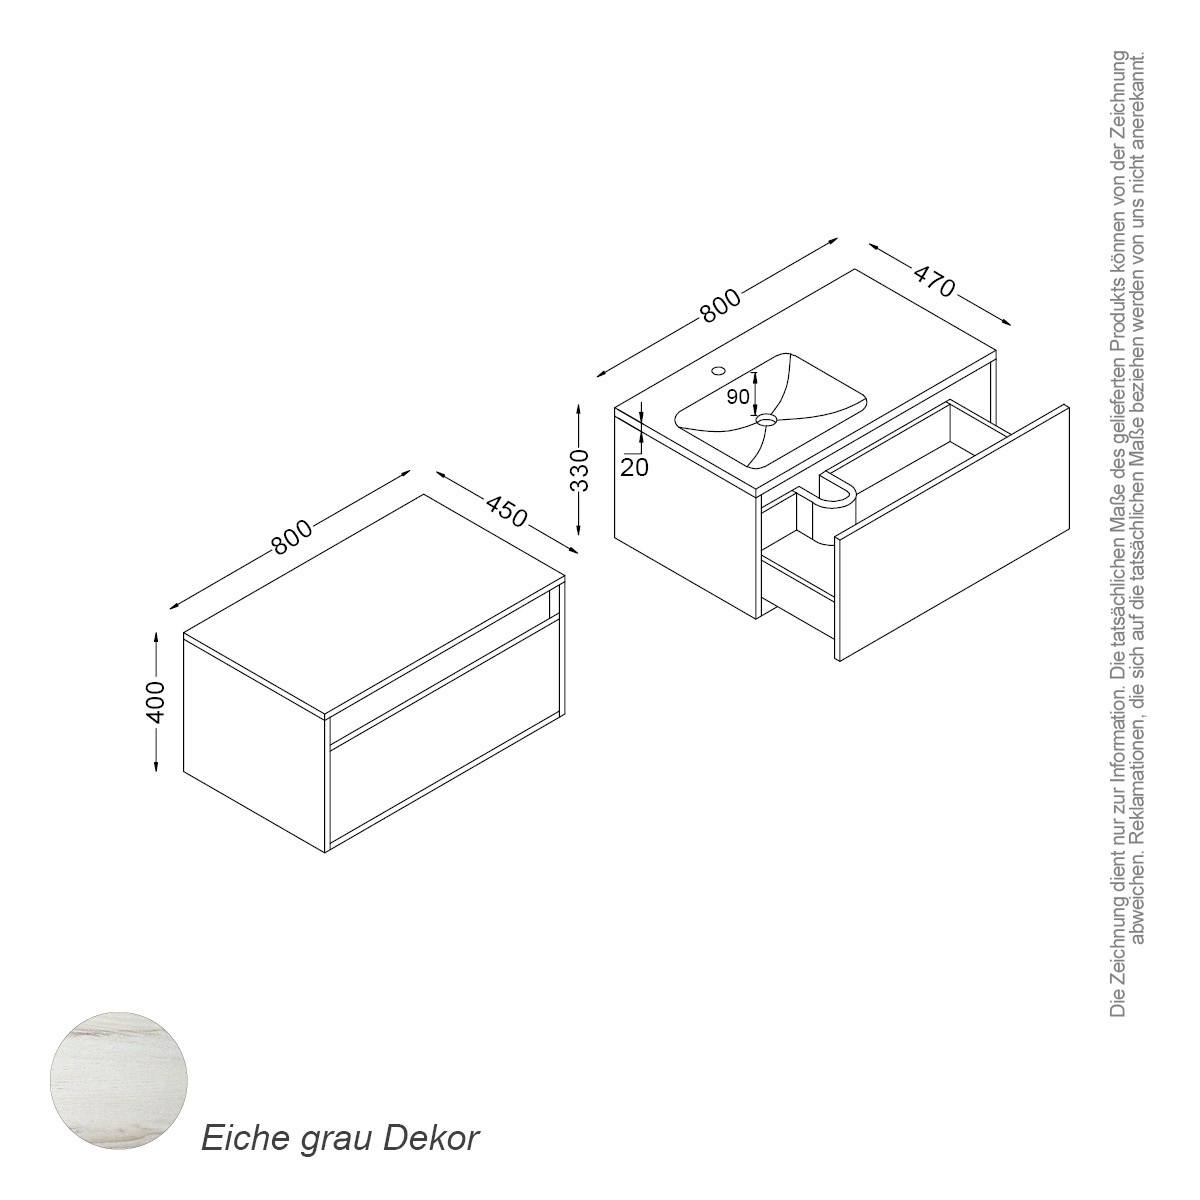 bern set 80 cm eiche grau badewelt badezimmer m bel waschtisch sets bern. Black Bedroom Furniture Sets. Home Design Ideas